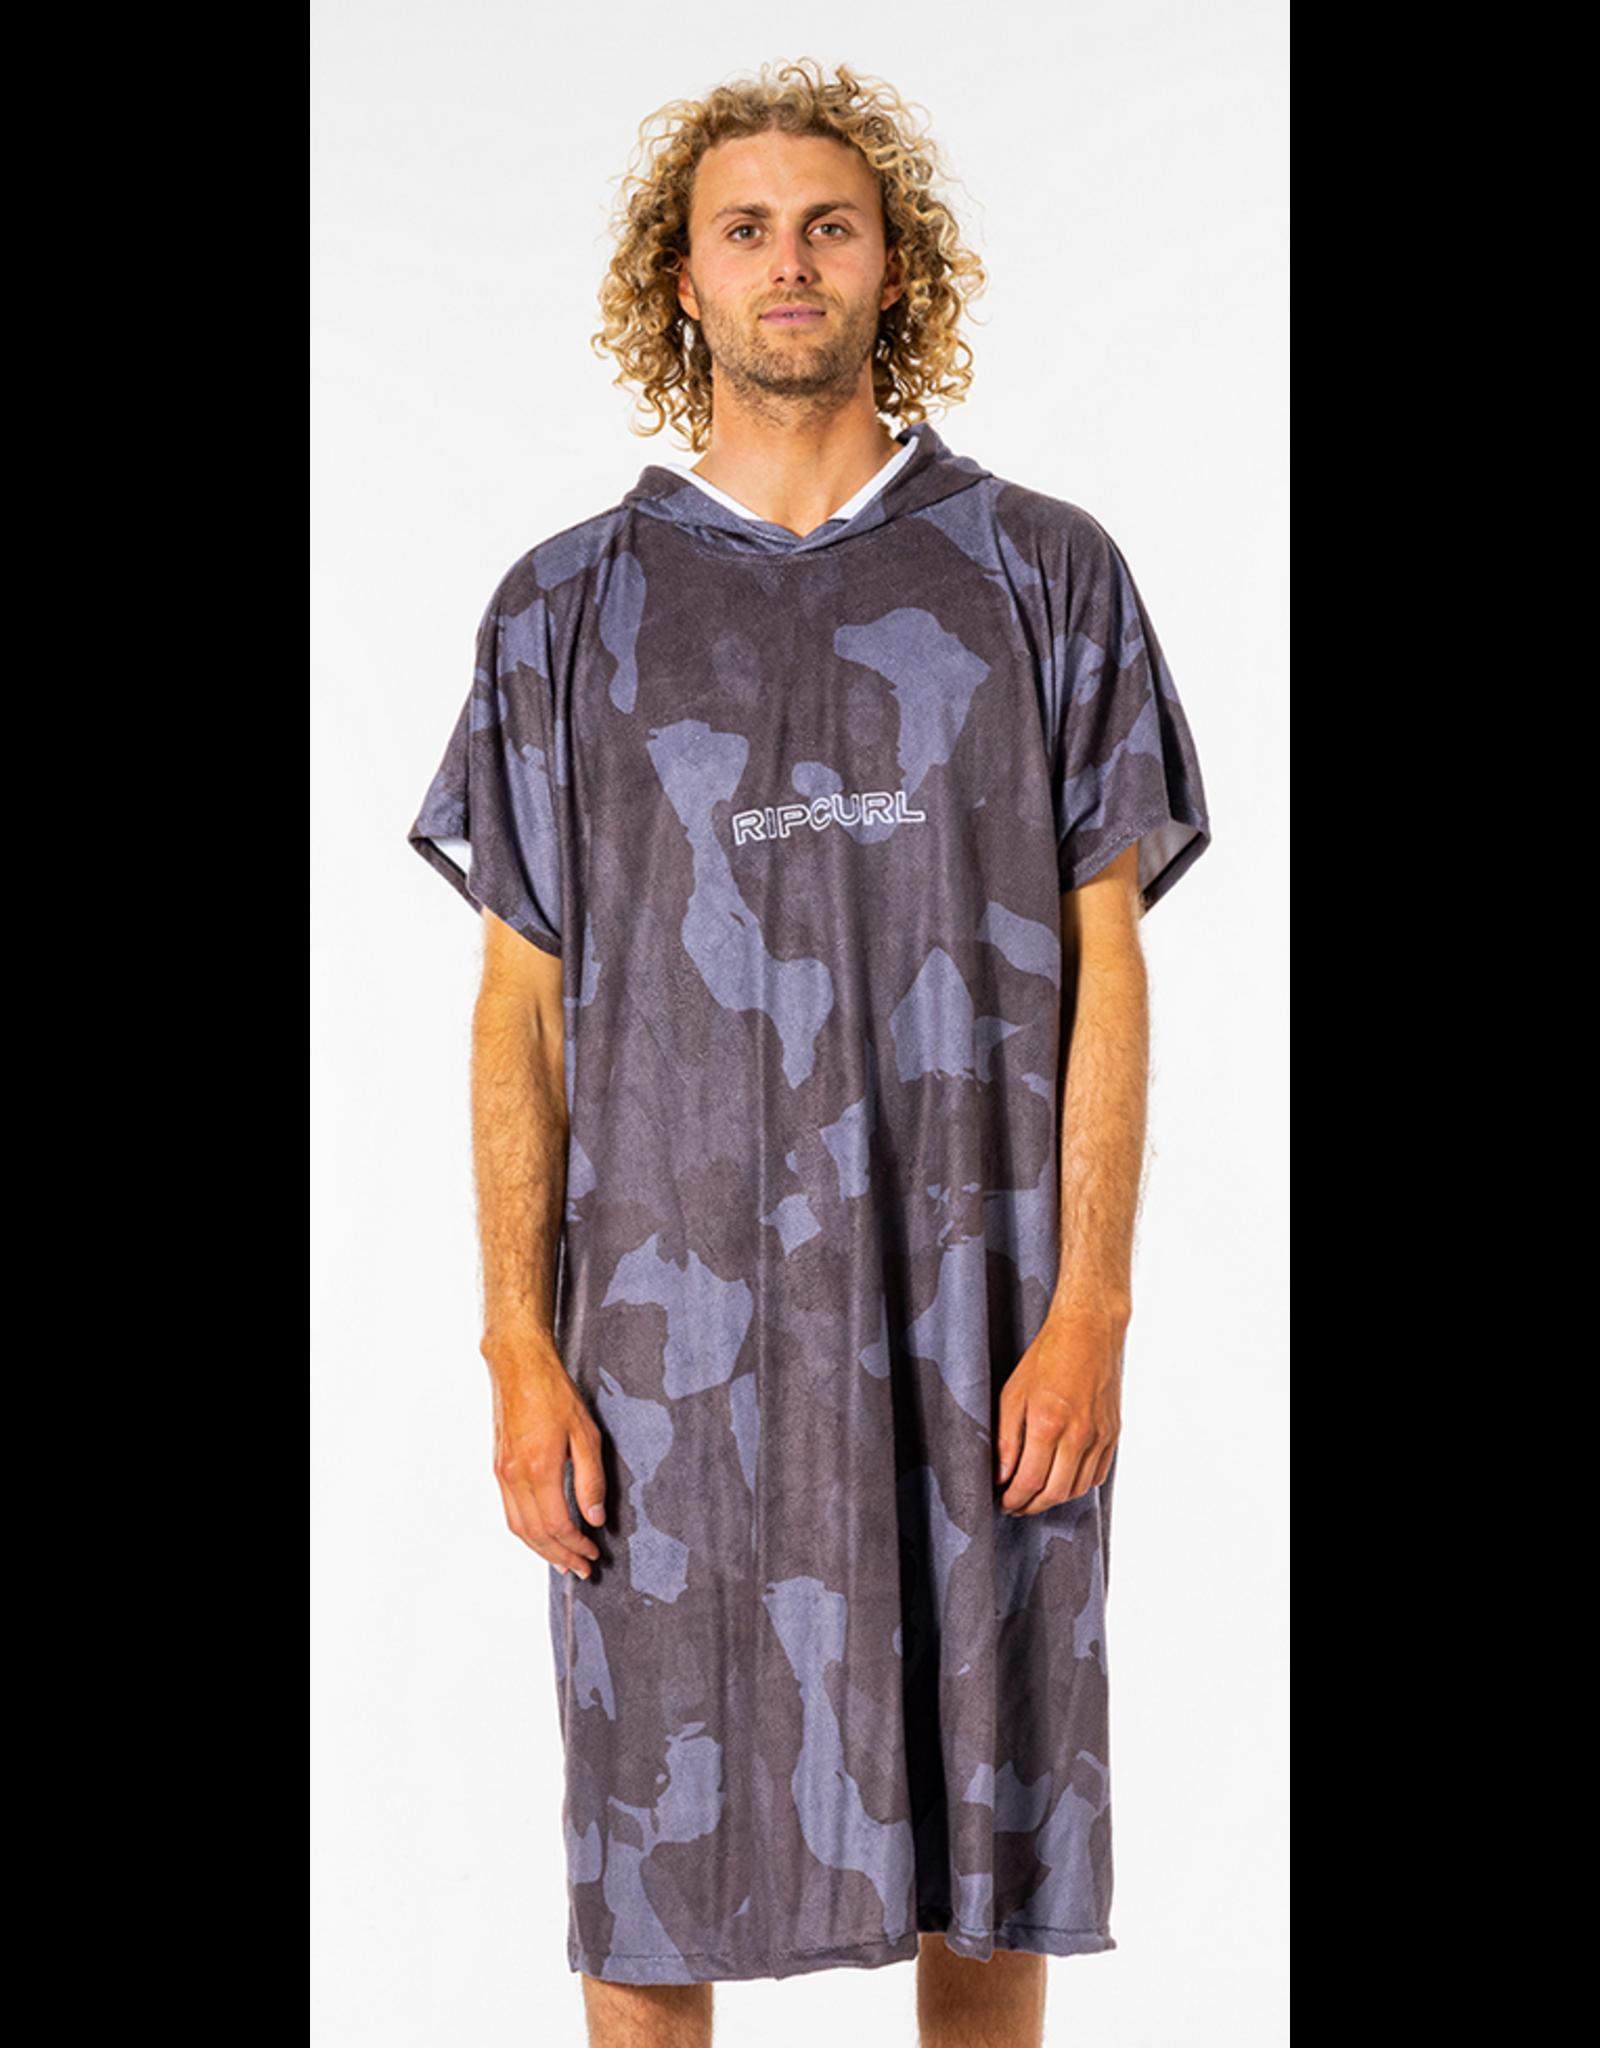 Rip Curl Rip Curl Mix Up Print Hooded Towel Slate